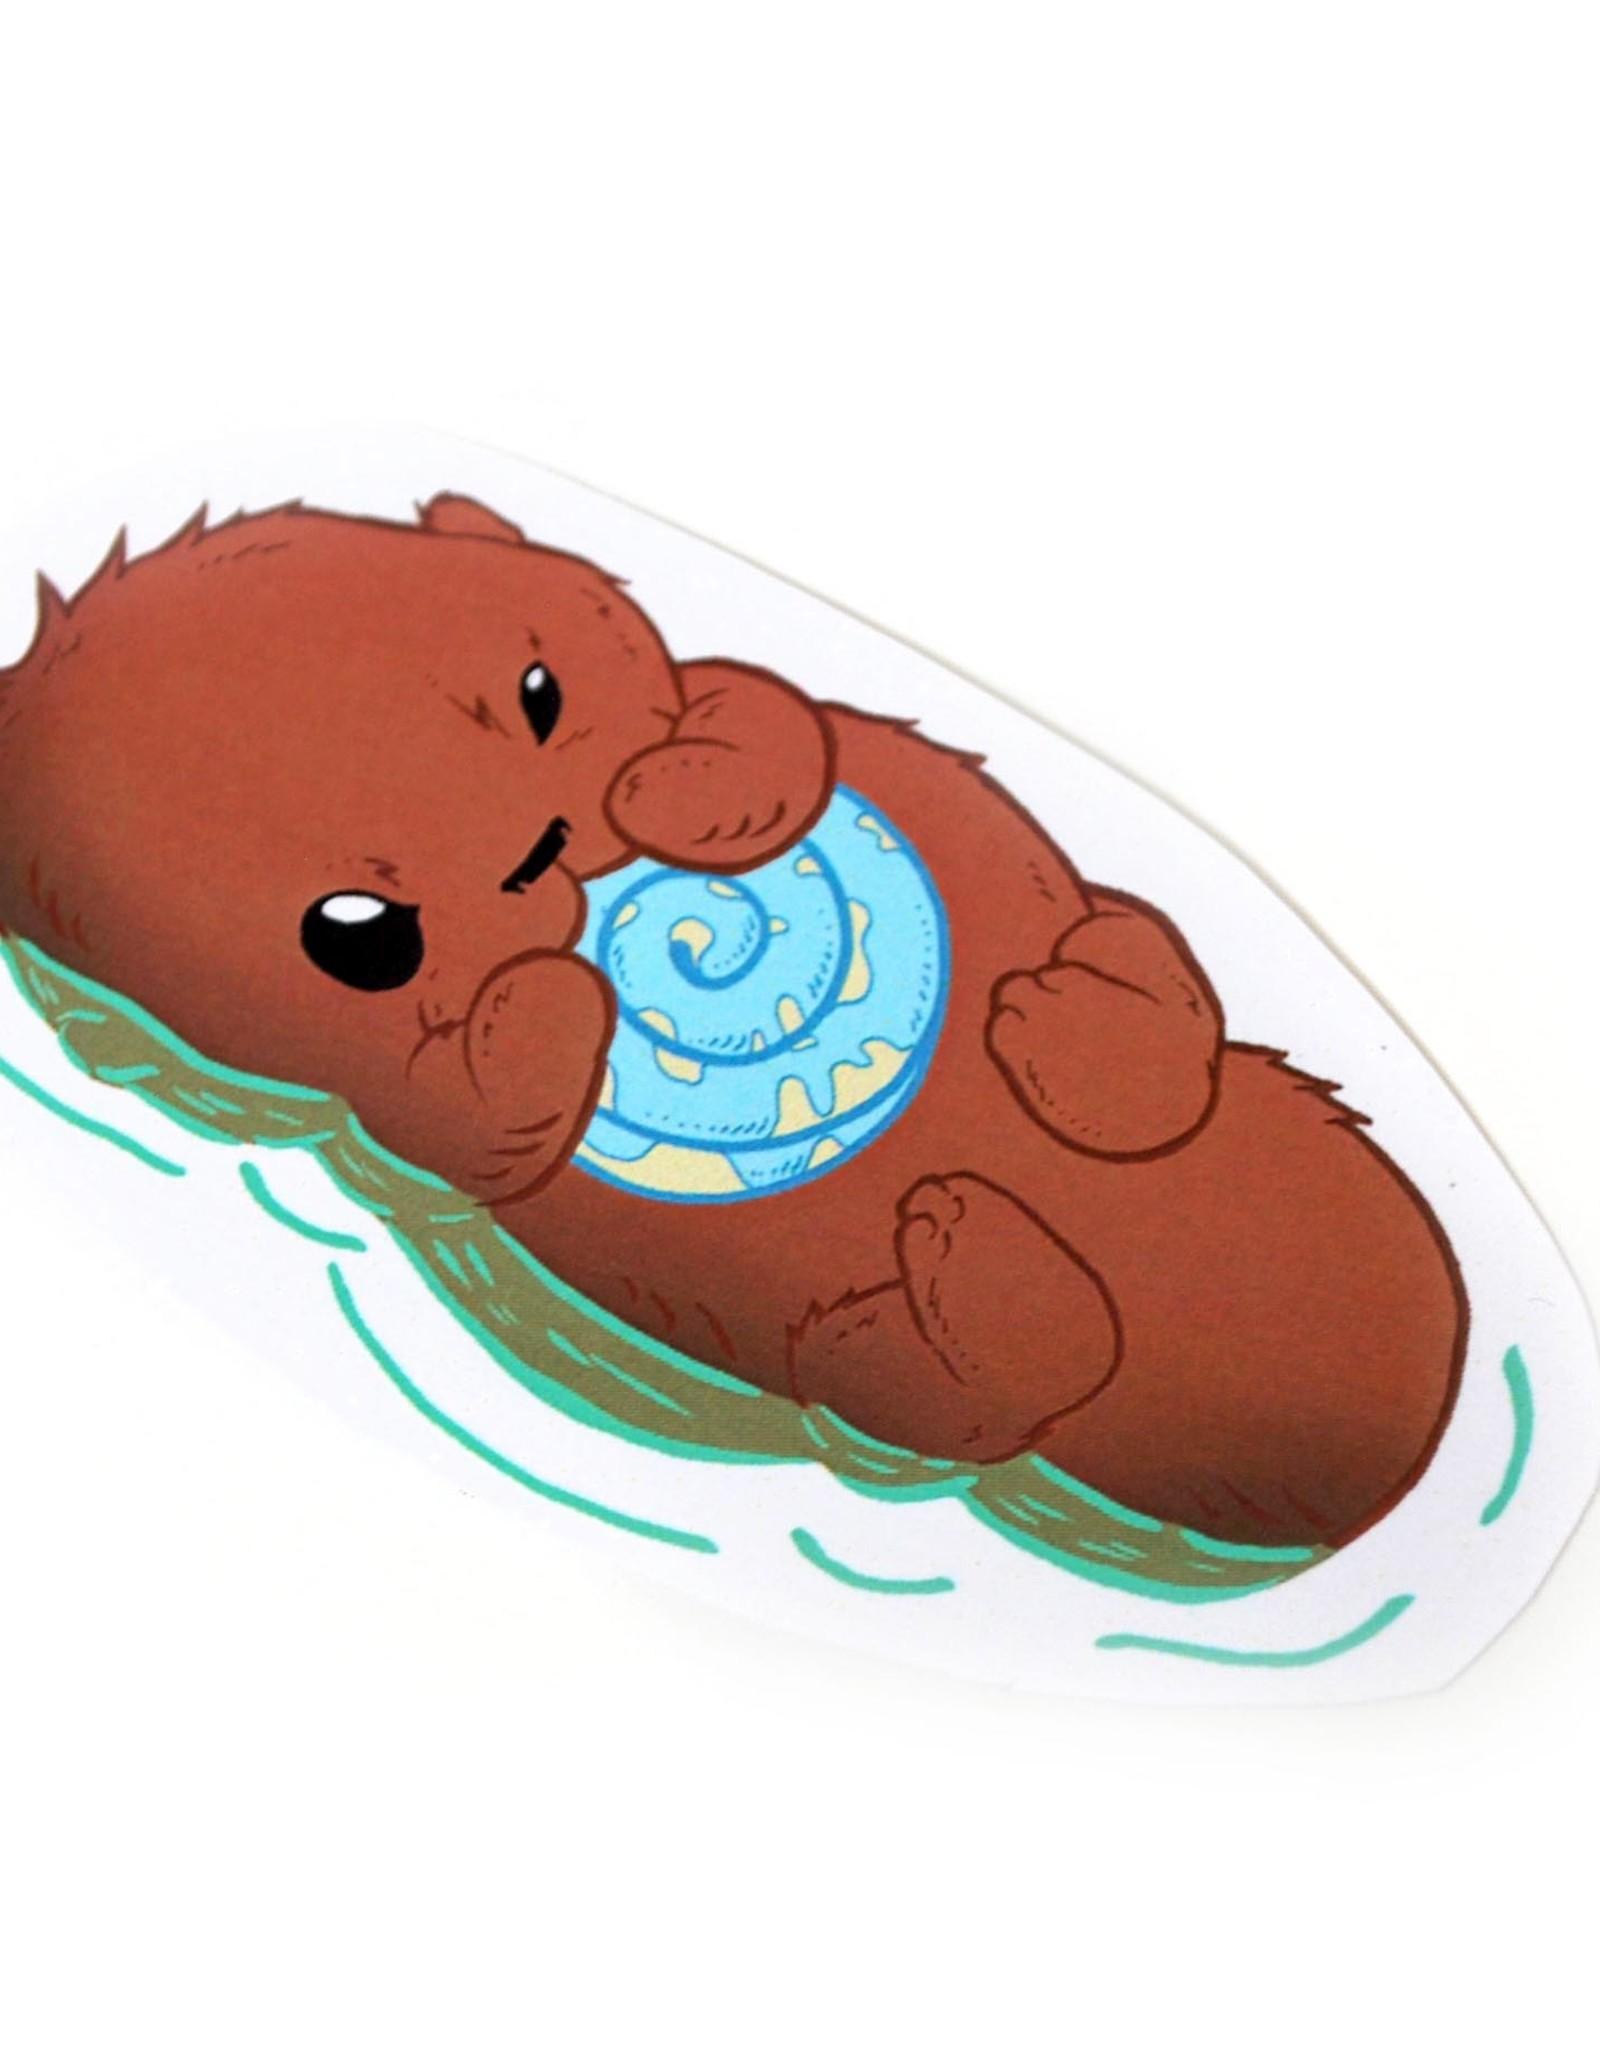 Knight Illustrations Phat Ass Small Otter Sticker by David Knight